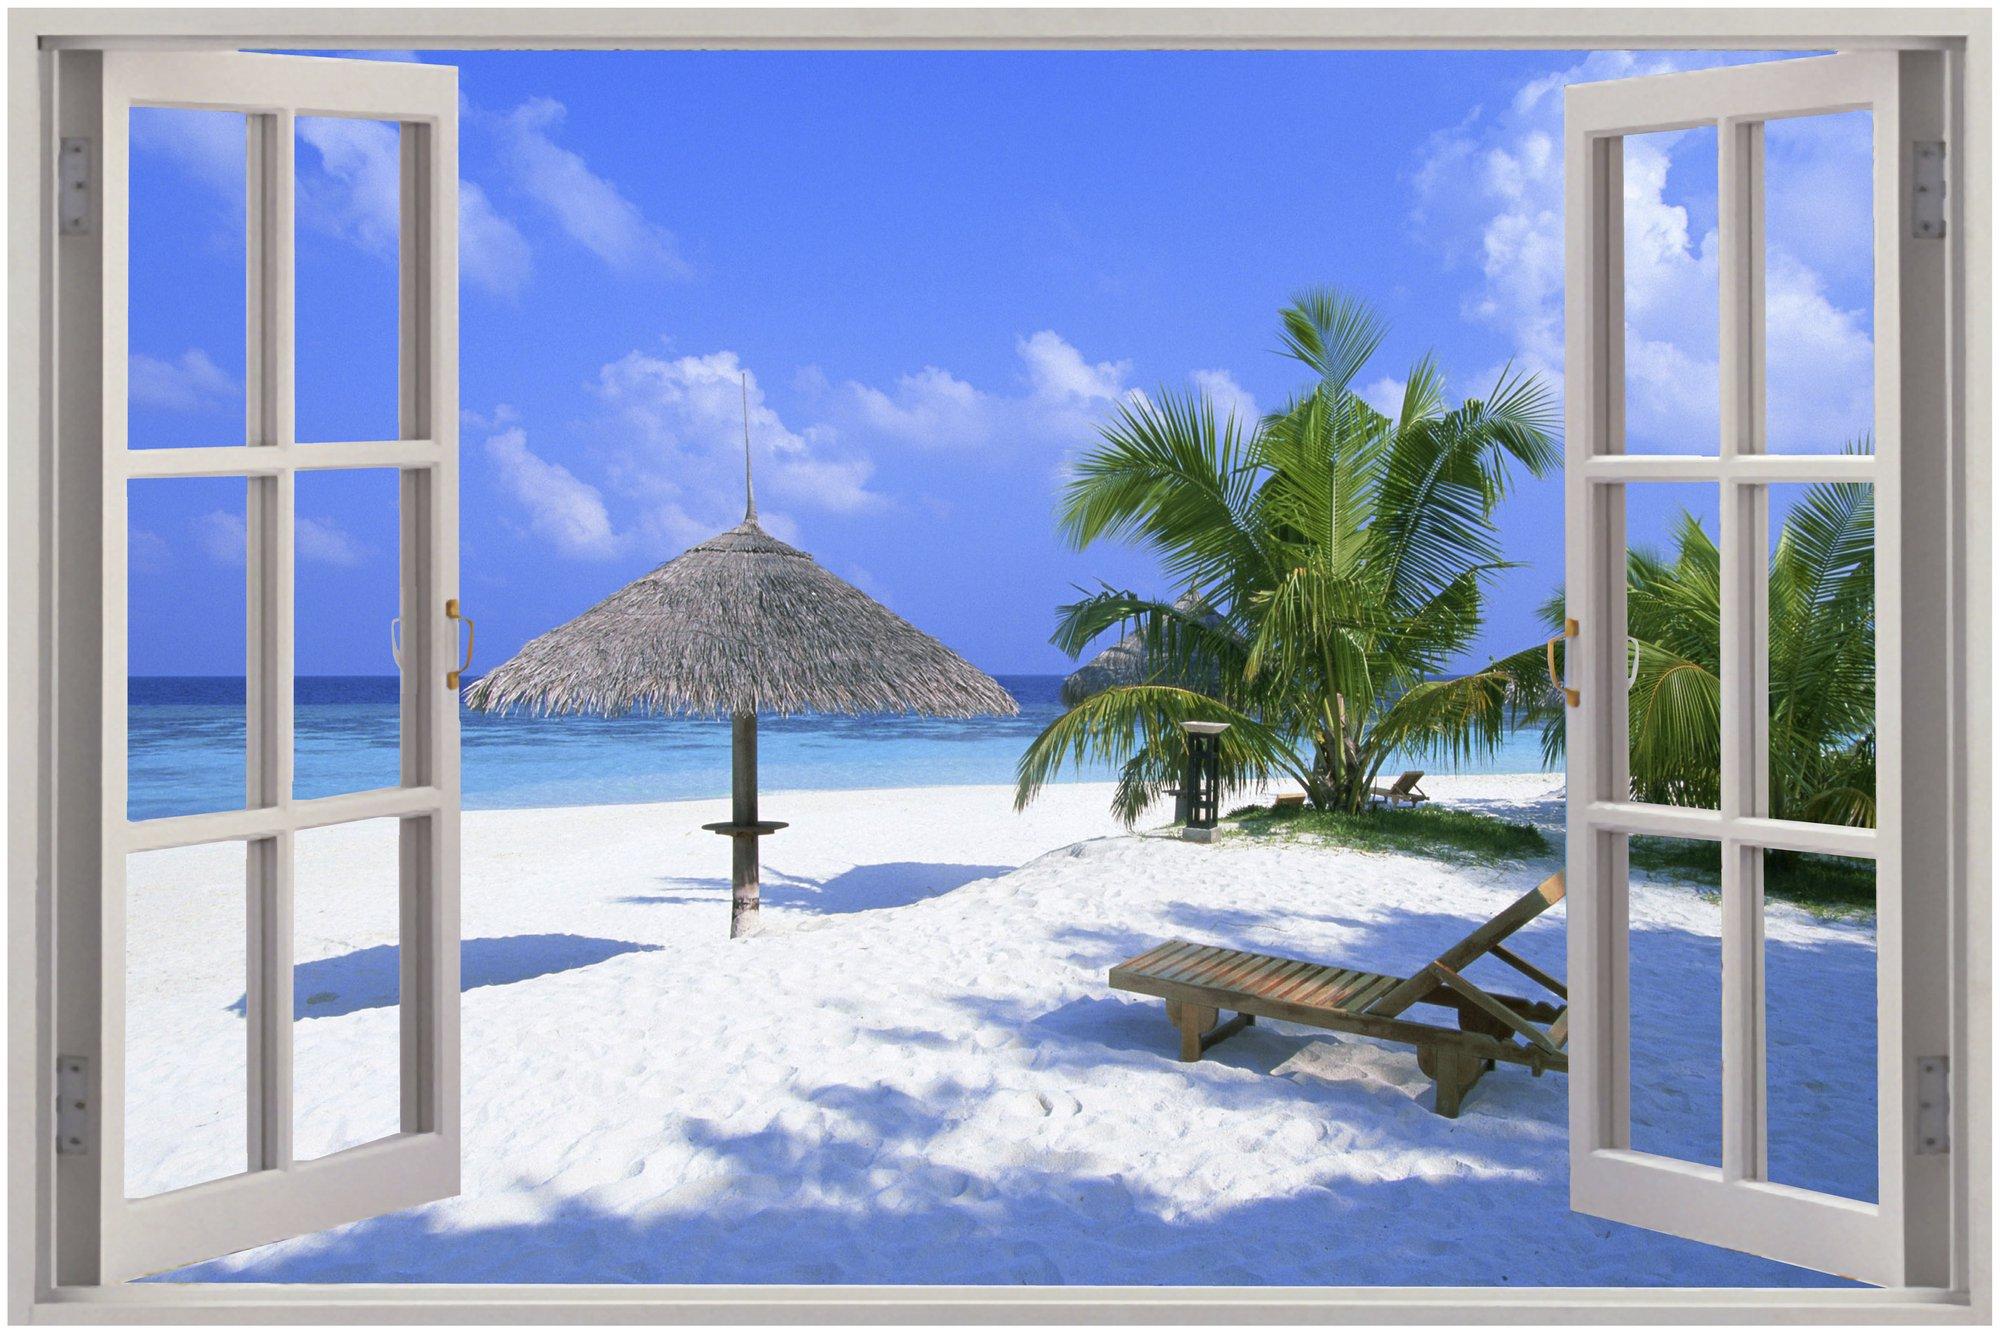 Window Exotic Beach View Wall Stickers Film Mural Art Decal Wallpaper 2000x1333